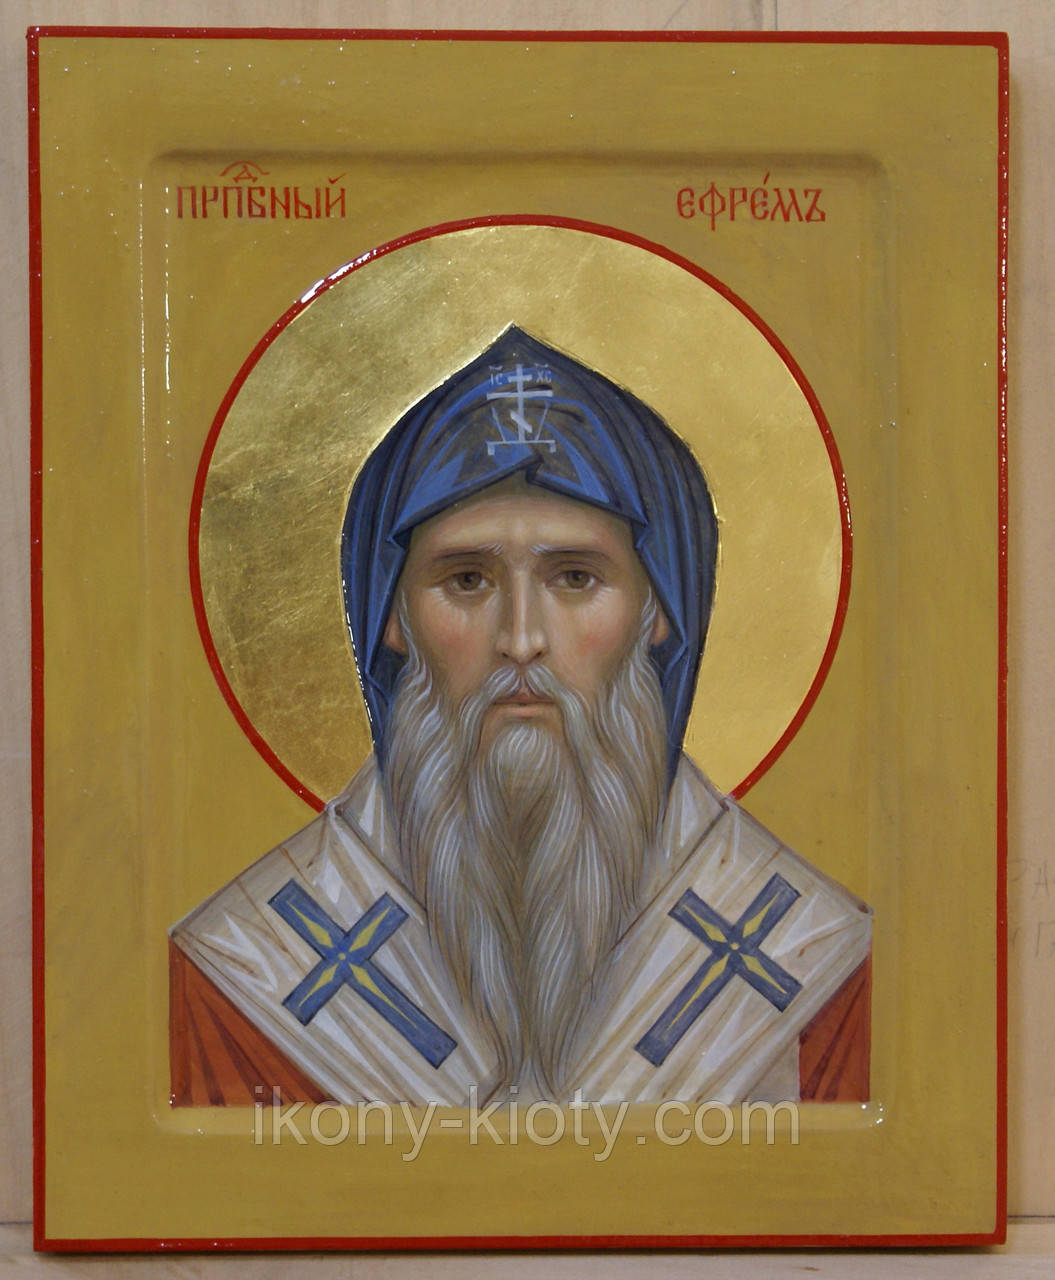 Икона Святого Ефрема.